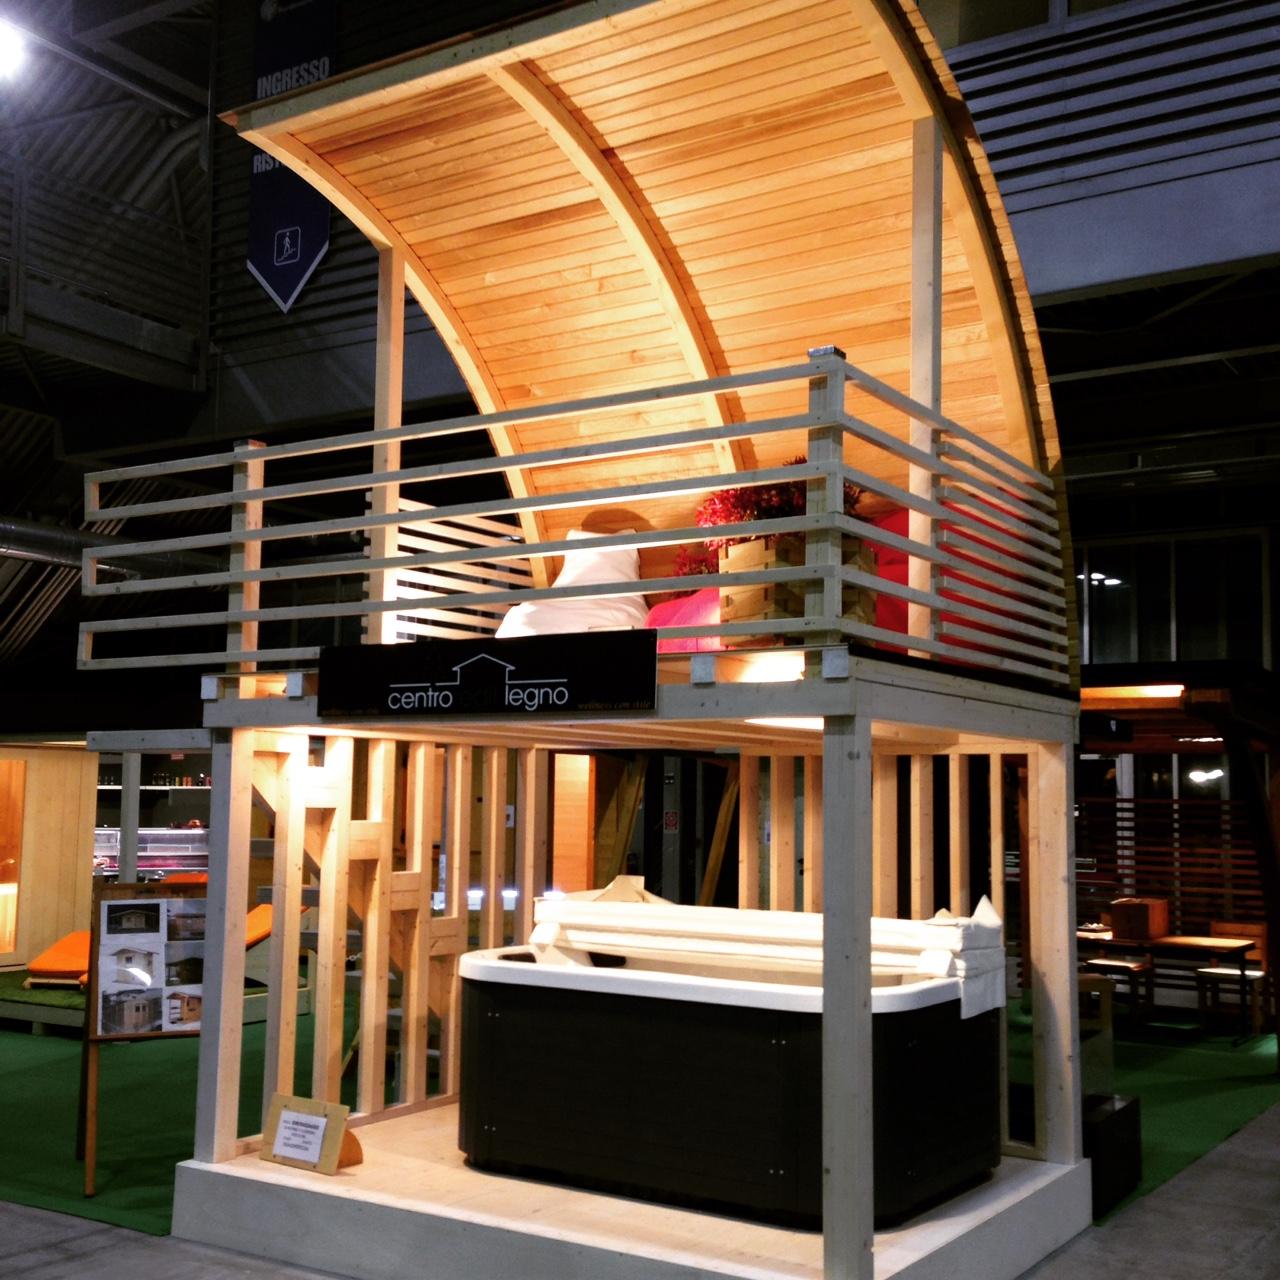 Tenda moderna per porta panoramica for Gazebo legno arredamento